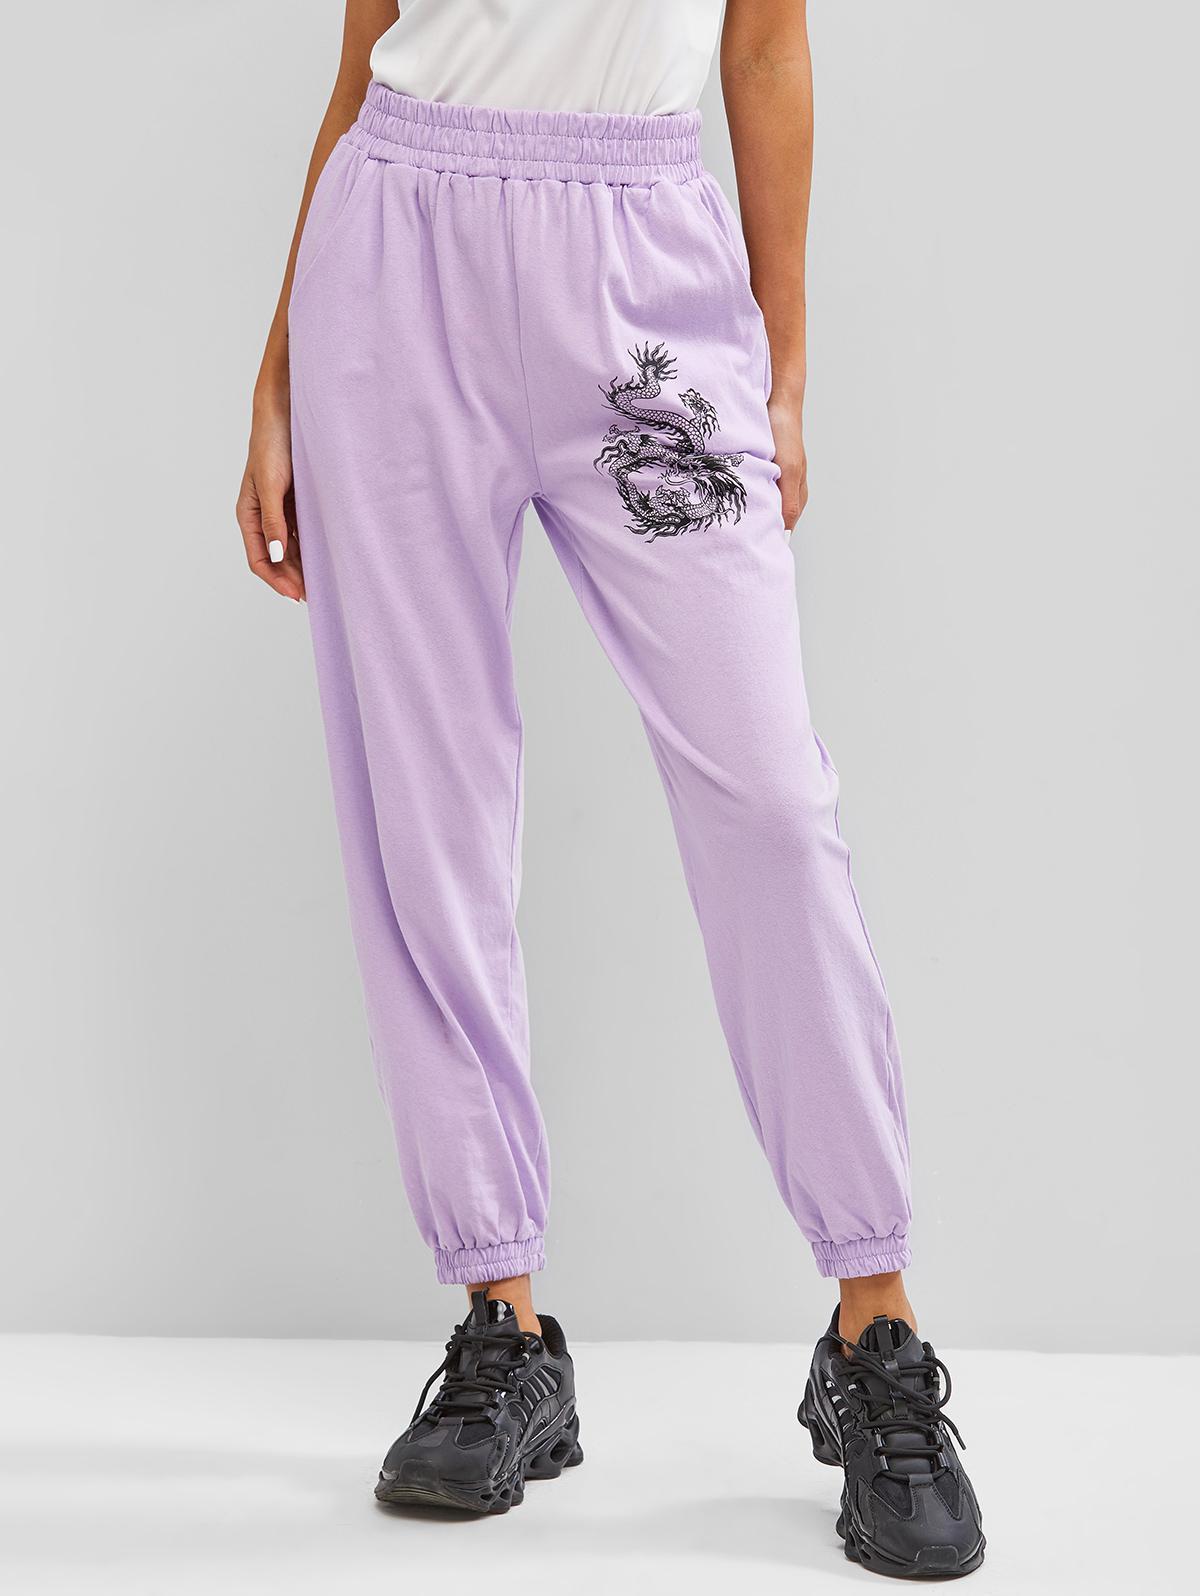 ZAFUL Pockets Dragon Oriental Jogger Sweatpants